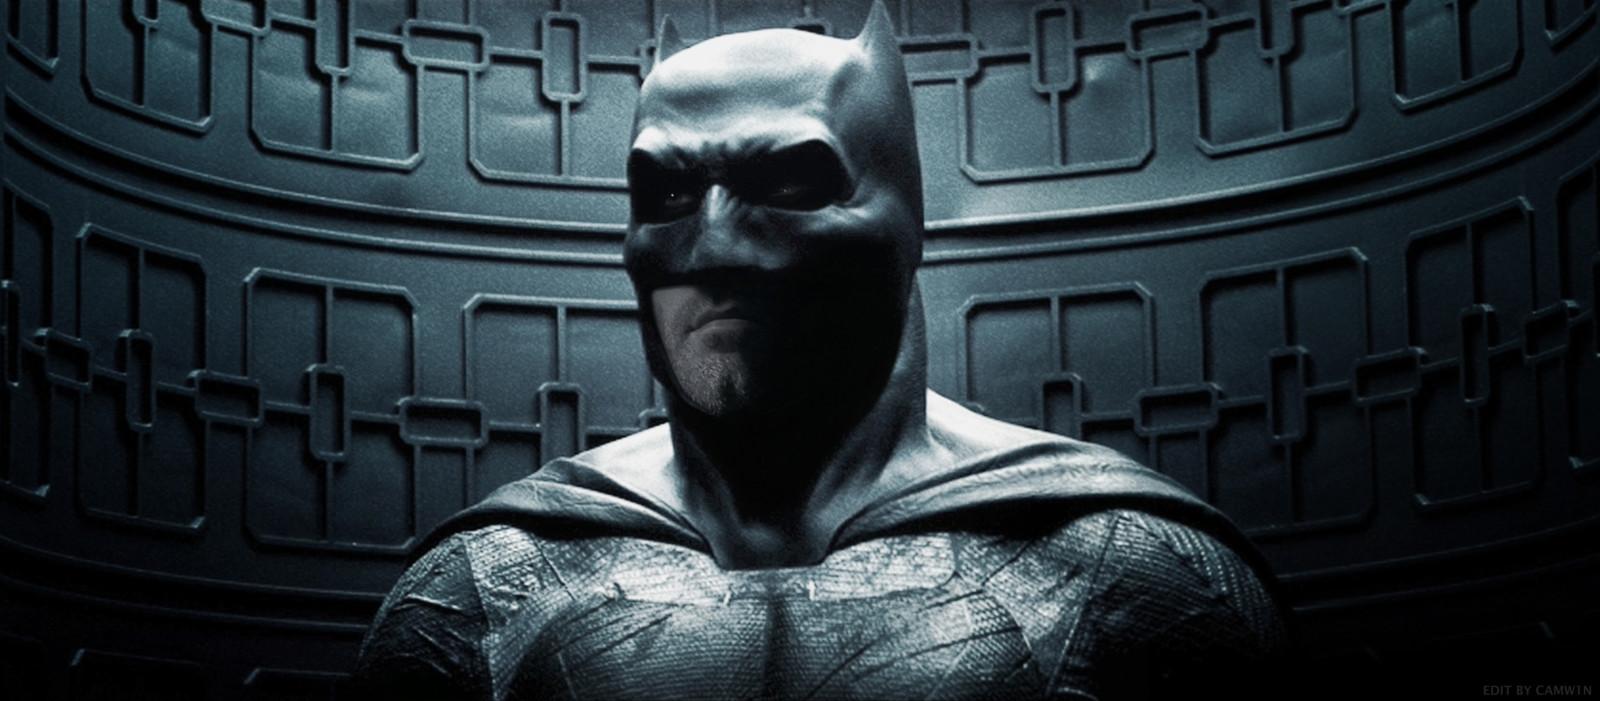 Batman V Superman Dawn of Justice   Wallpaper 2 by CAMW1N on 1600x701